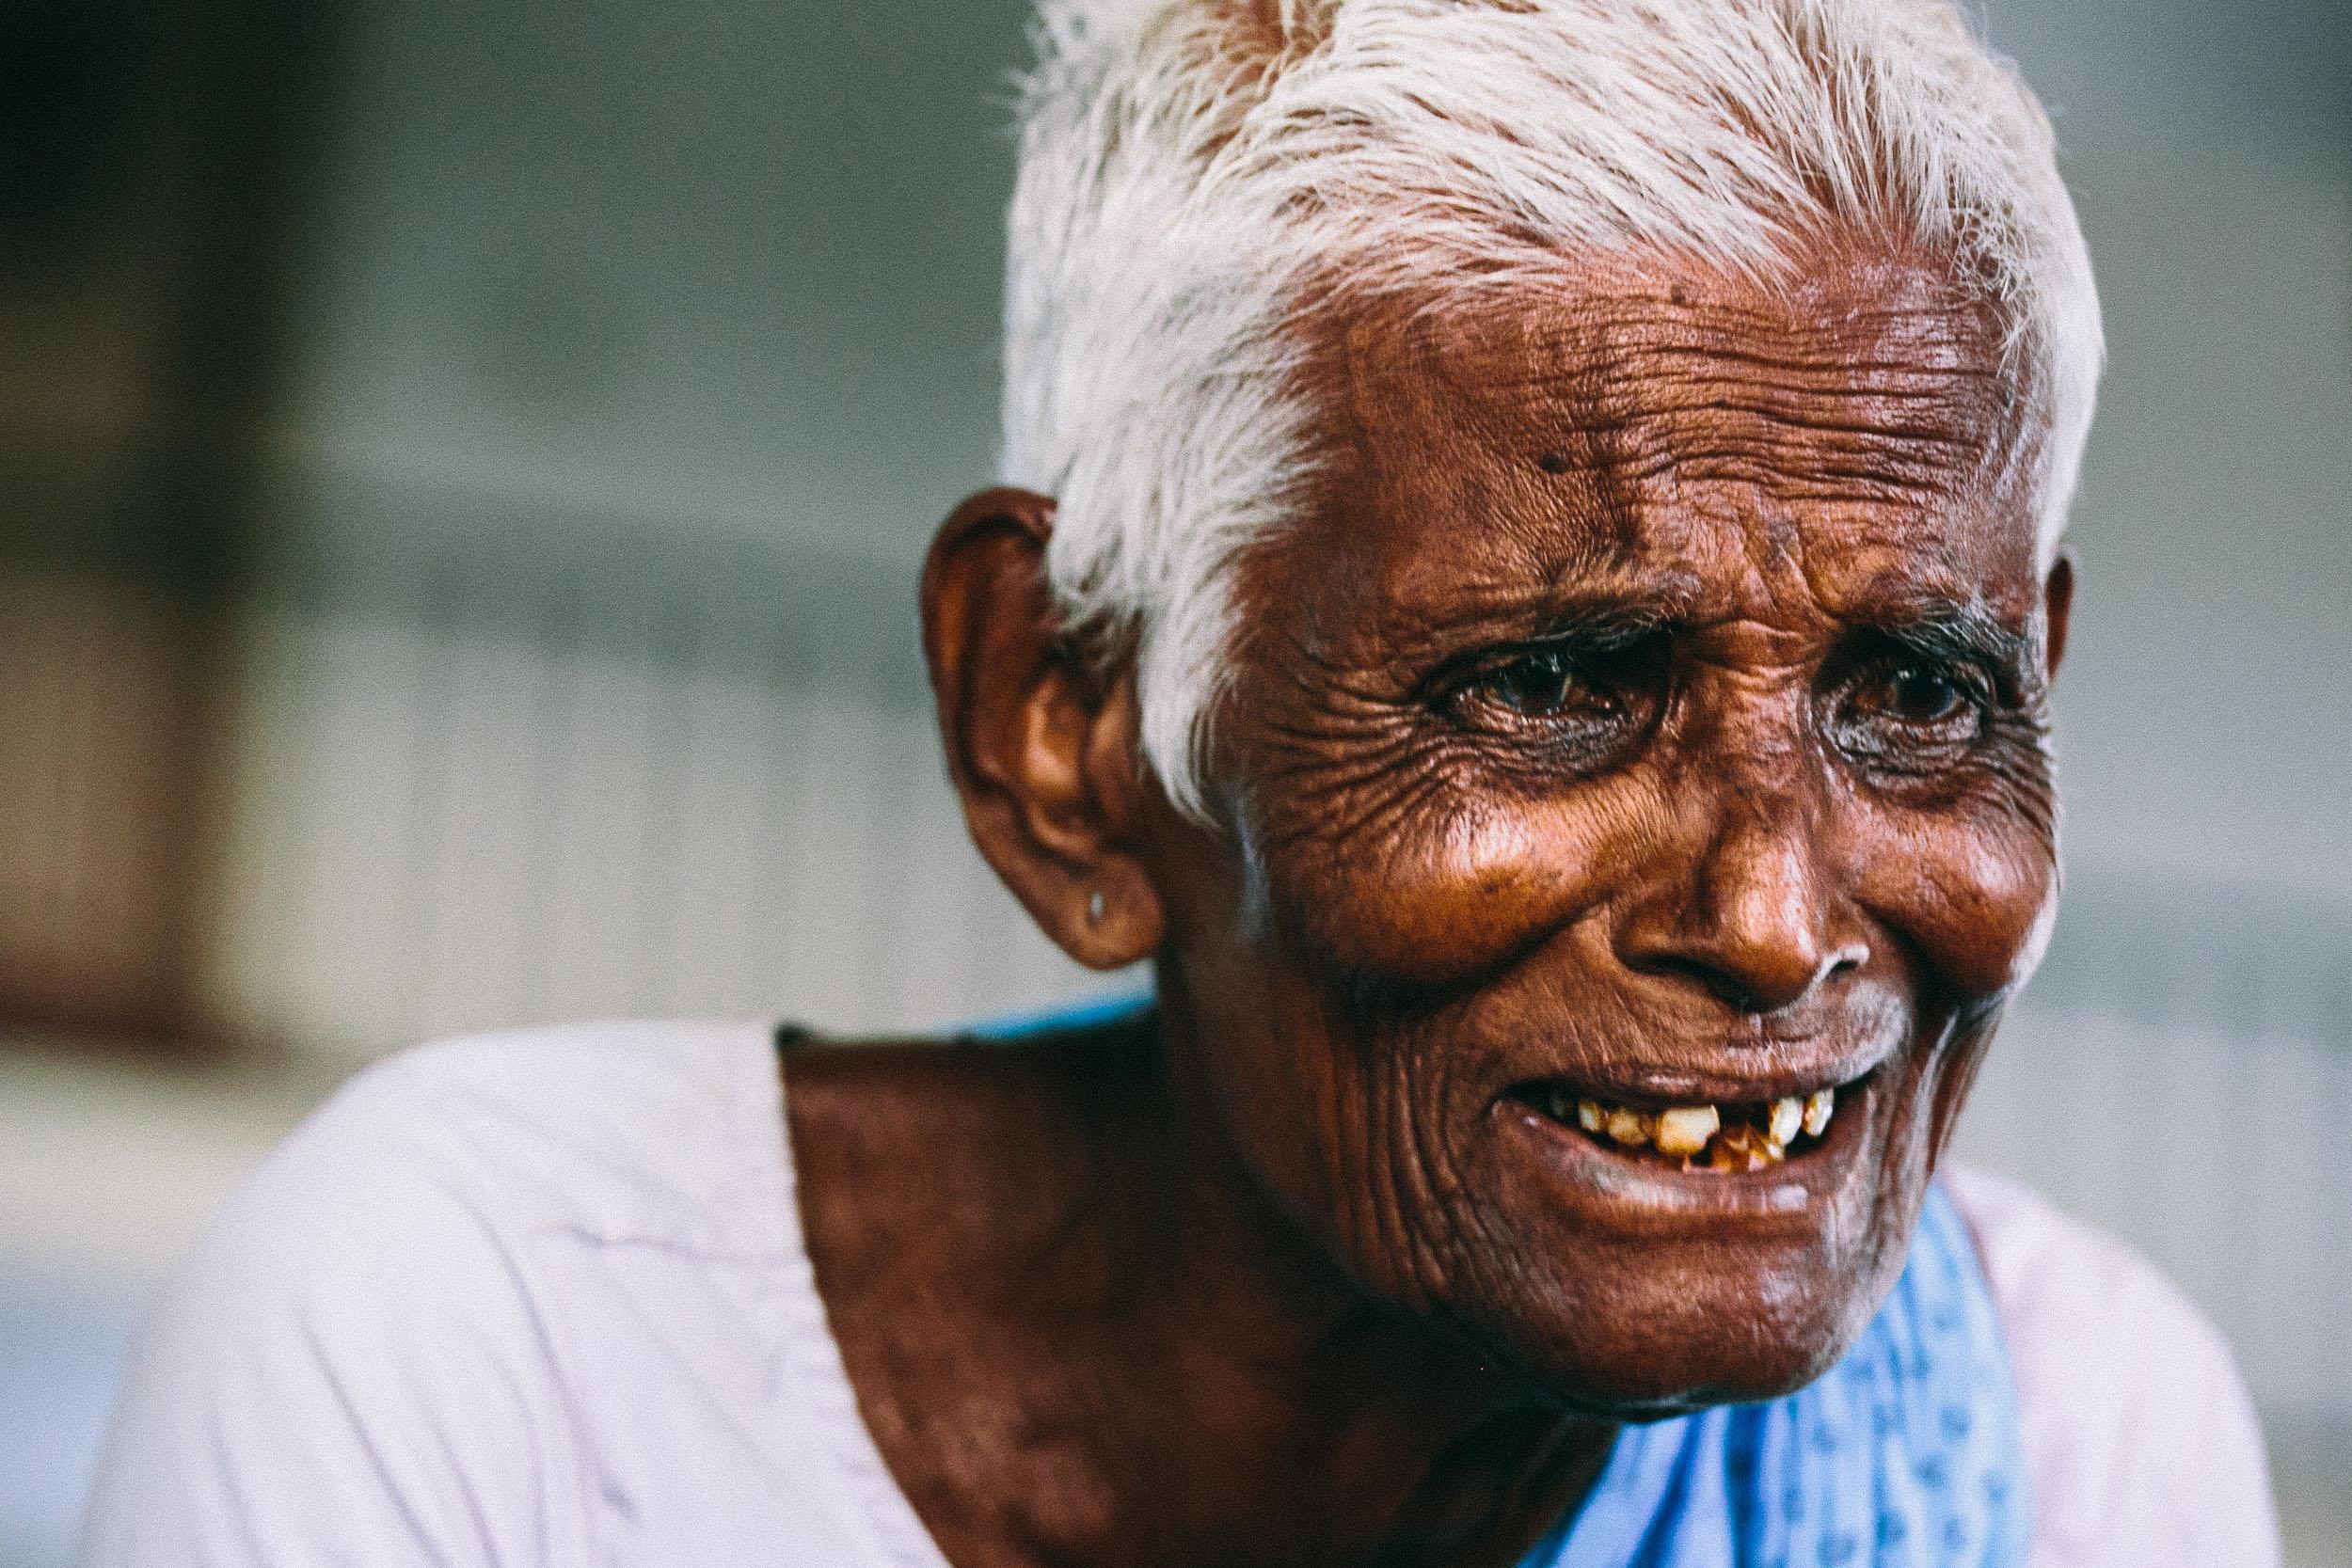 brian-callaway-india-photography-aravind-eye-hospital-27.jpg